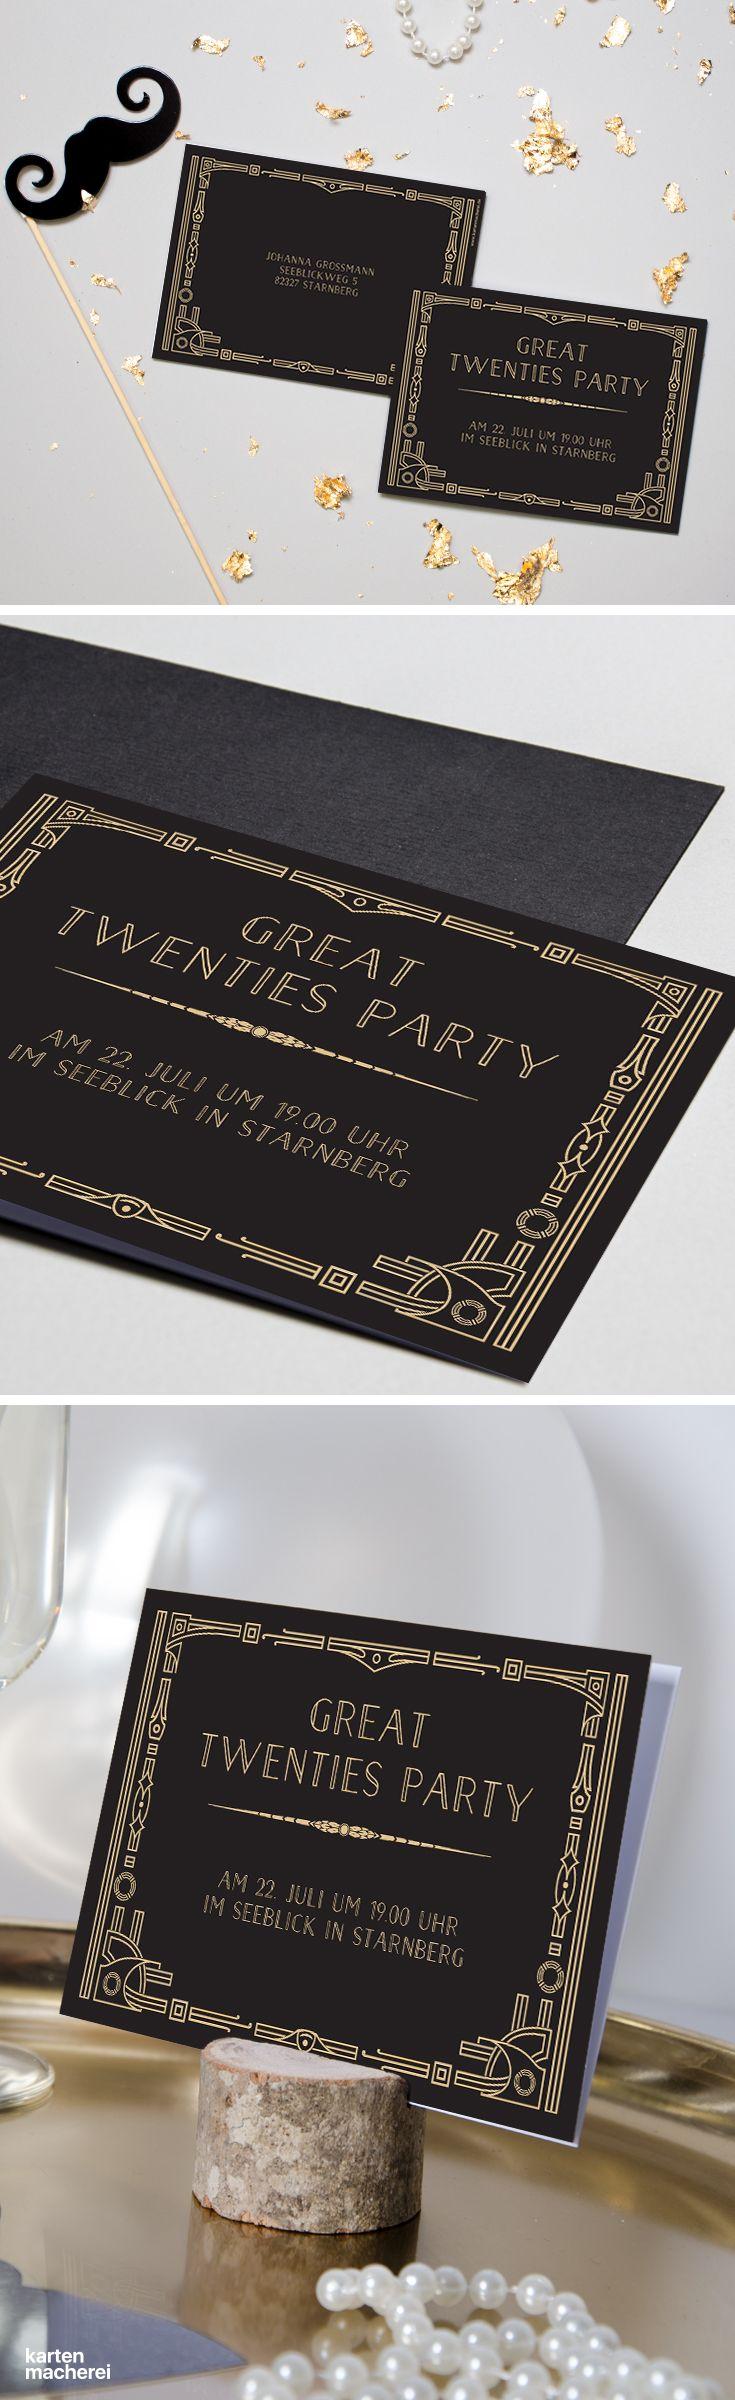 "Partyeinladung ""Golden Twenties"" #Silvesterparty #Papeterie #Silvester #Einladungskarten #kartenmacherei"